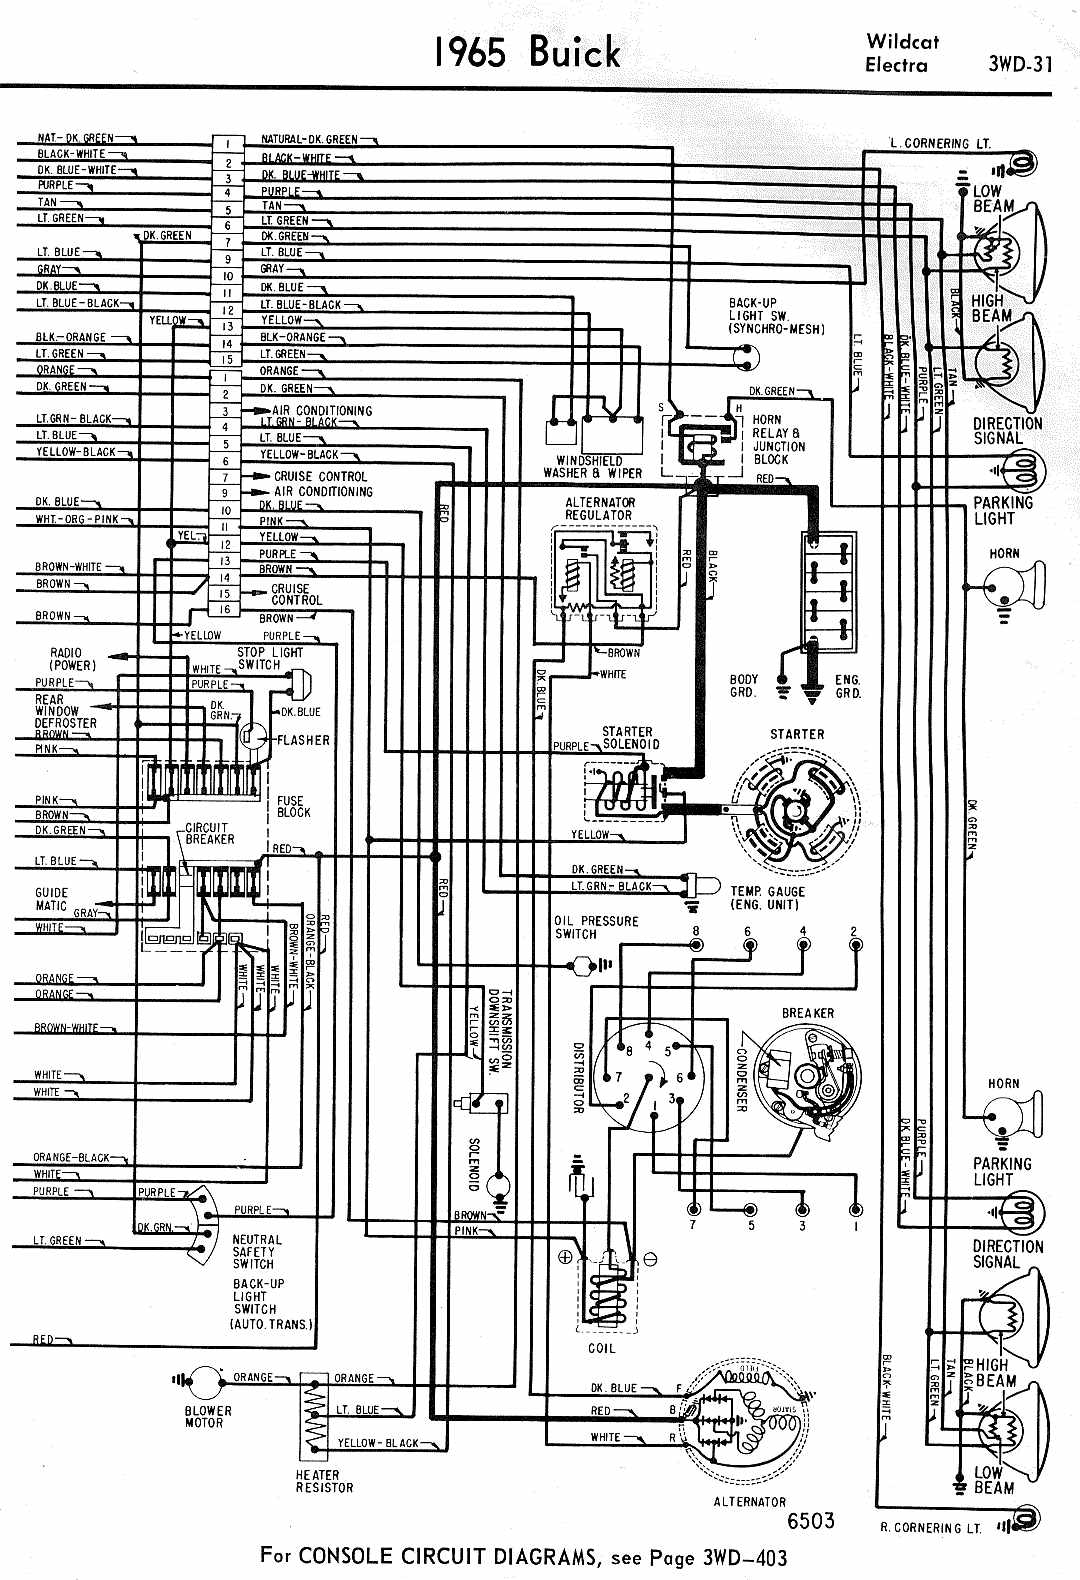 wiring diagram buick wildcat - wiring diagram p on engine diagrams,  hvac diagrams,